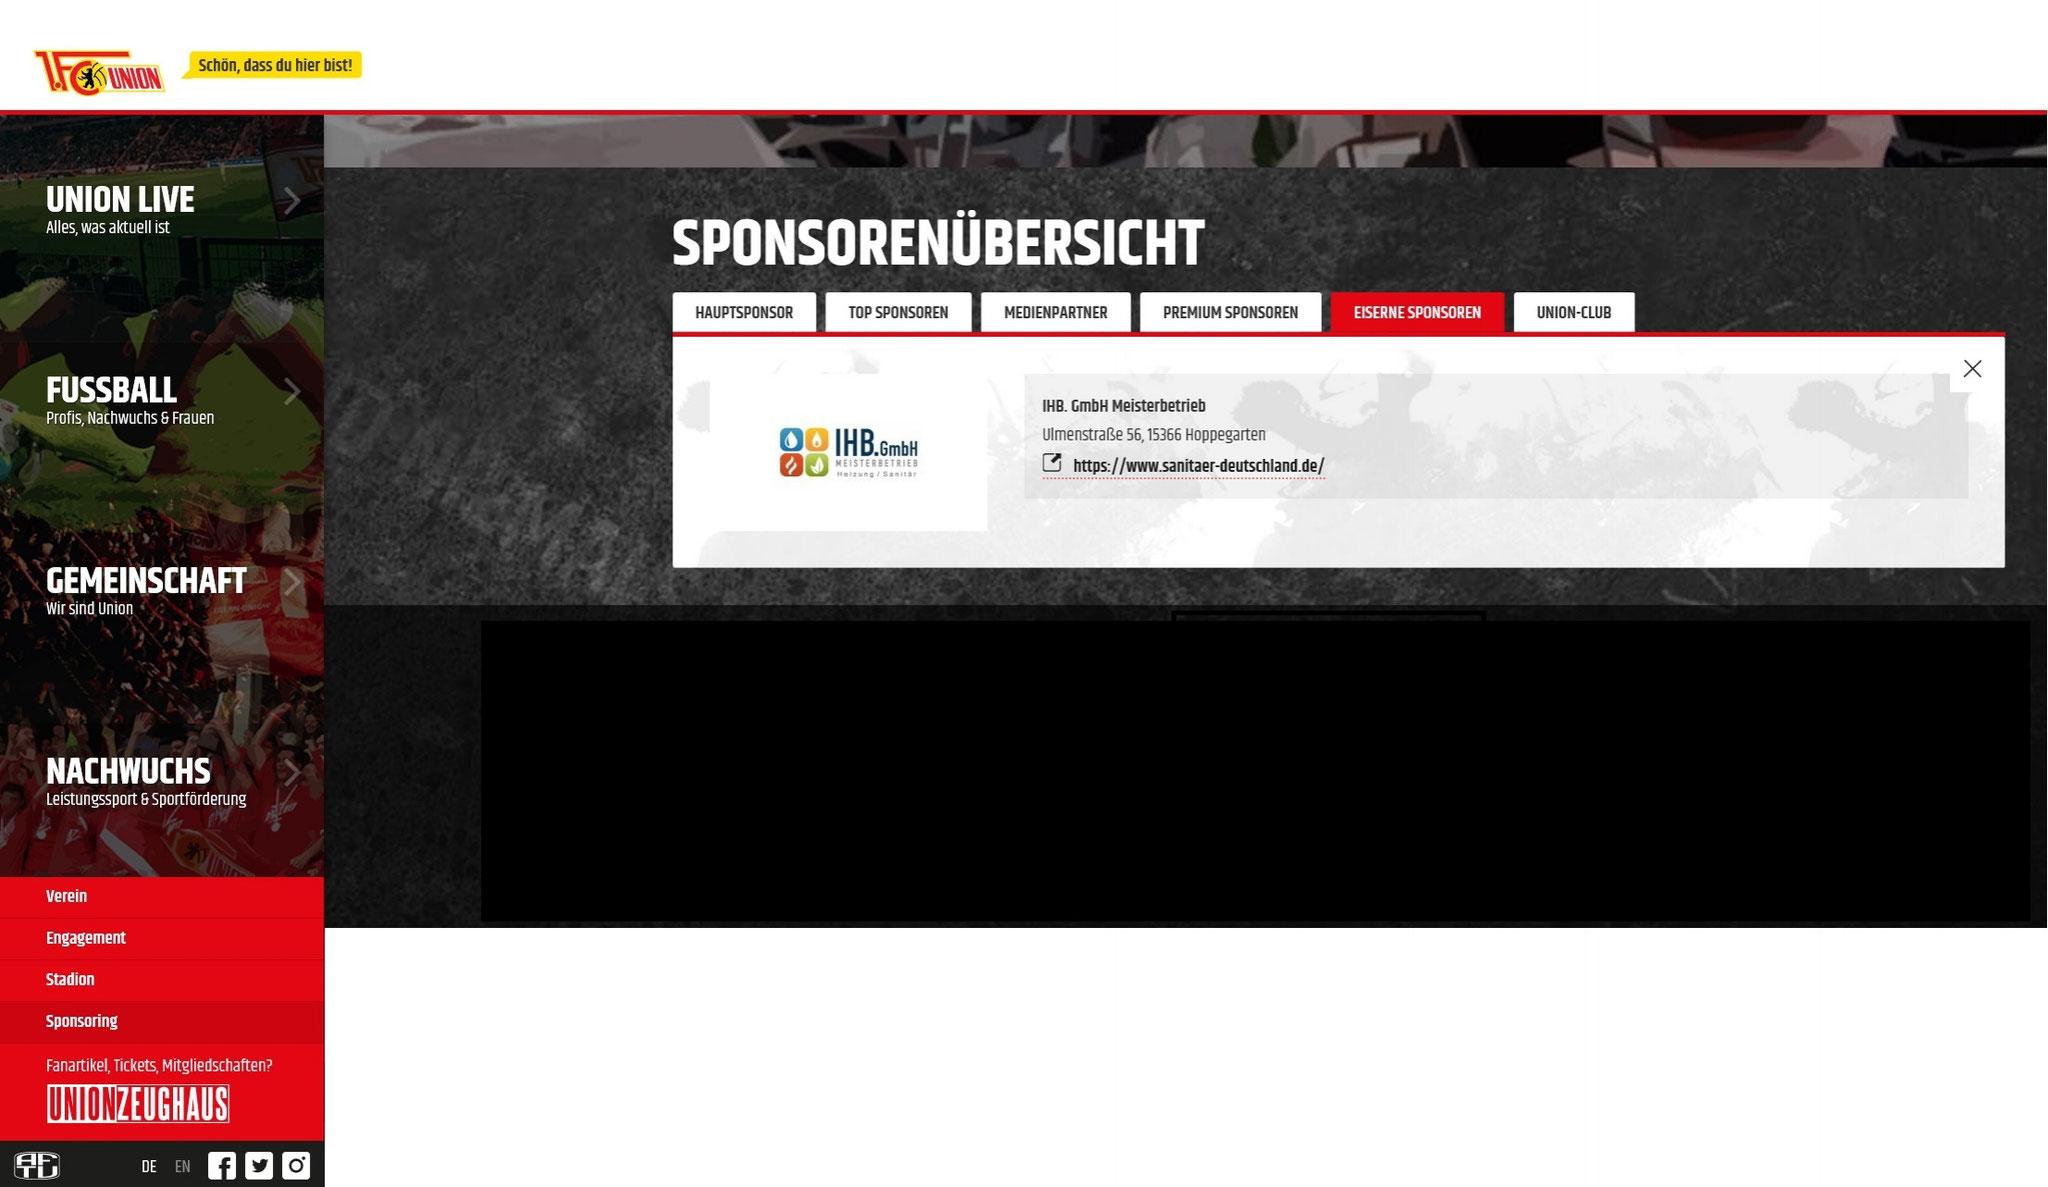 Eiserne Sponsoren - 1. FC Eisern Union